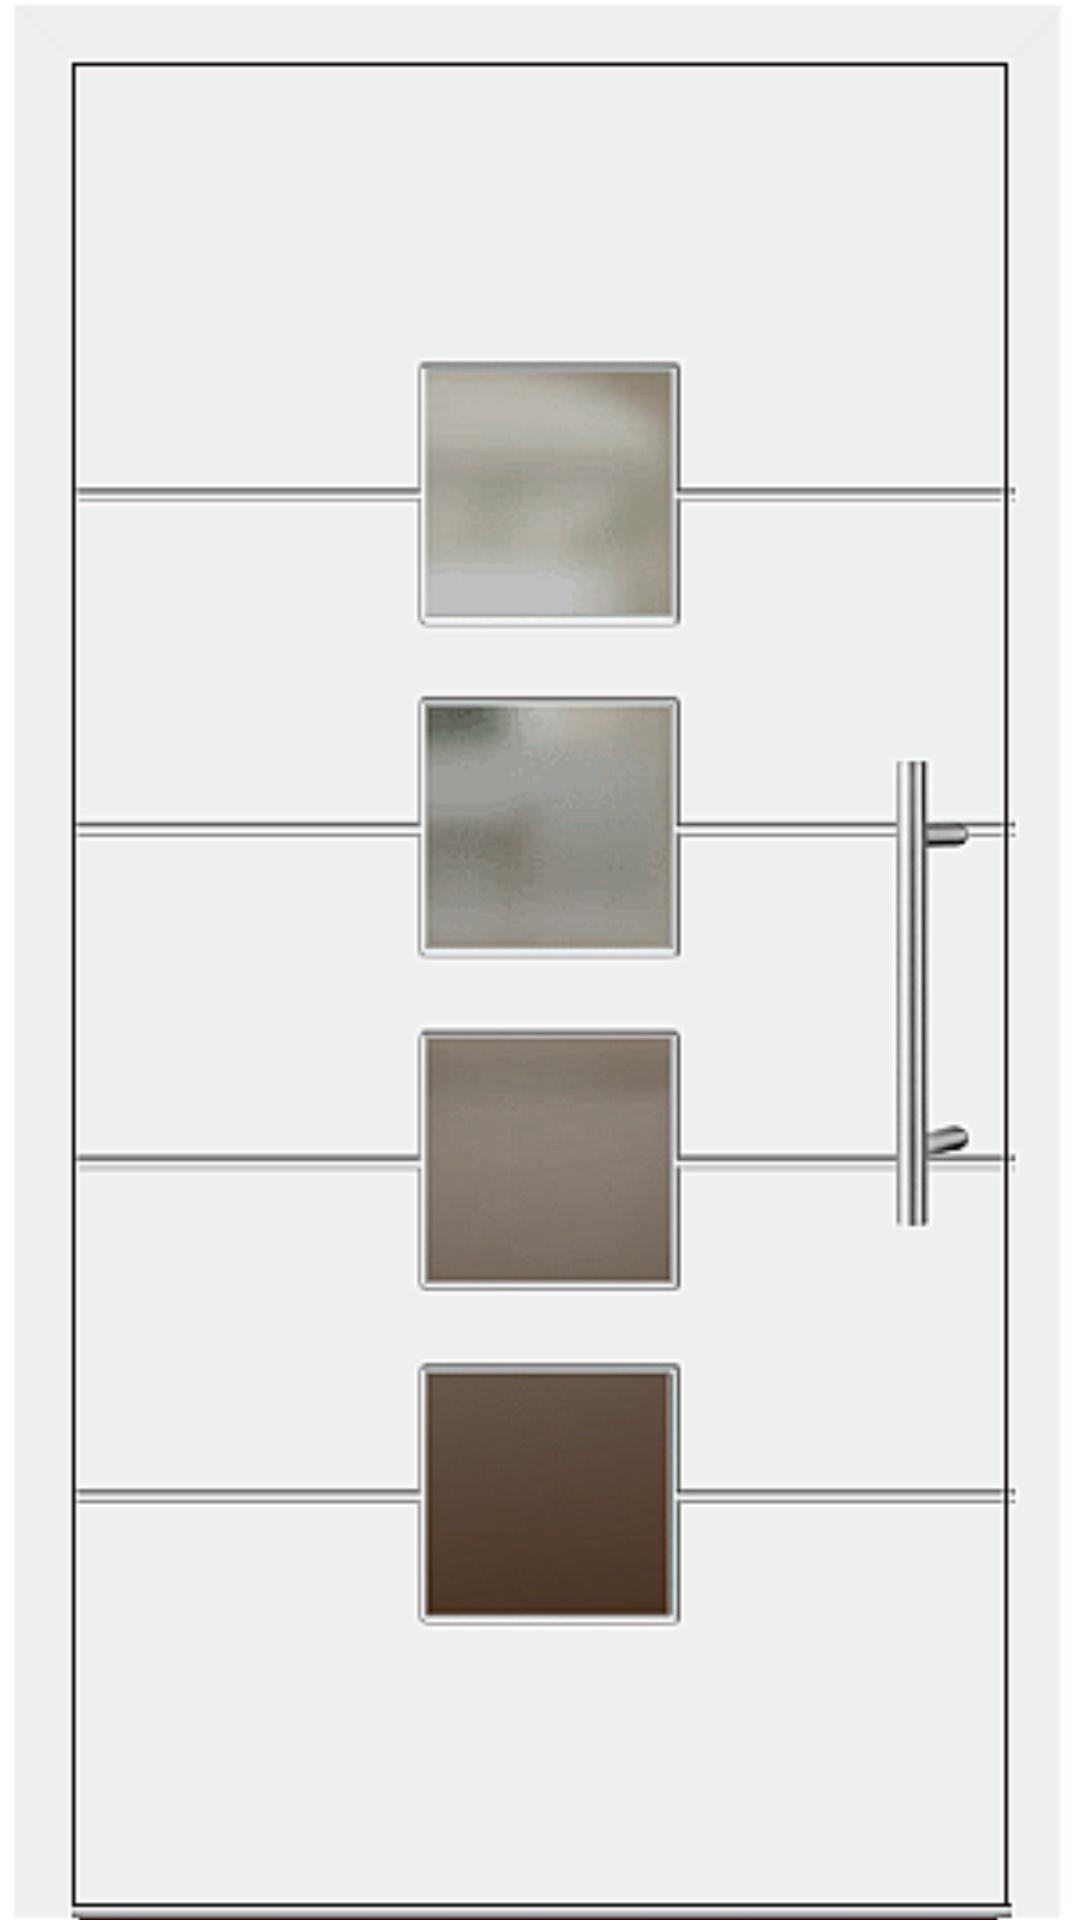 Aluminium Haustür Modell 6821-52 weiß